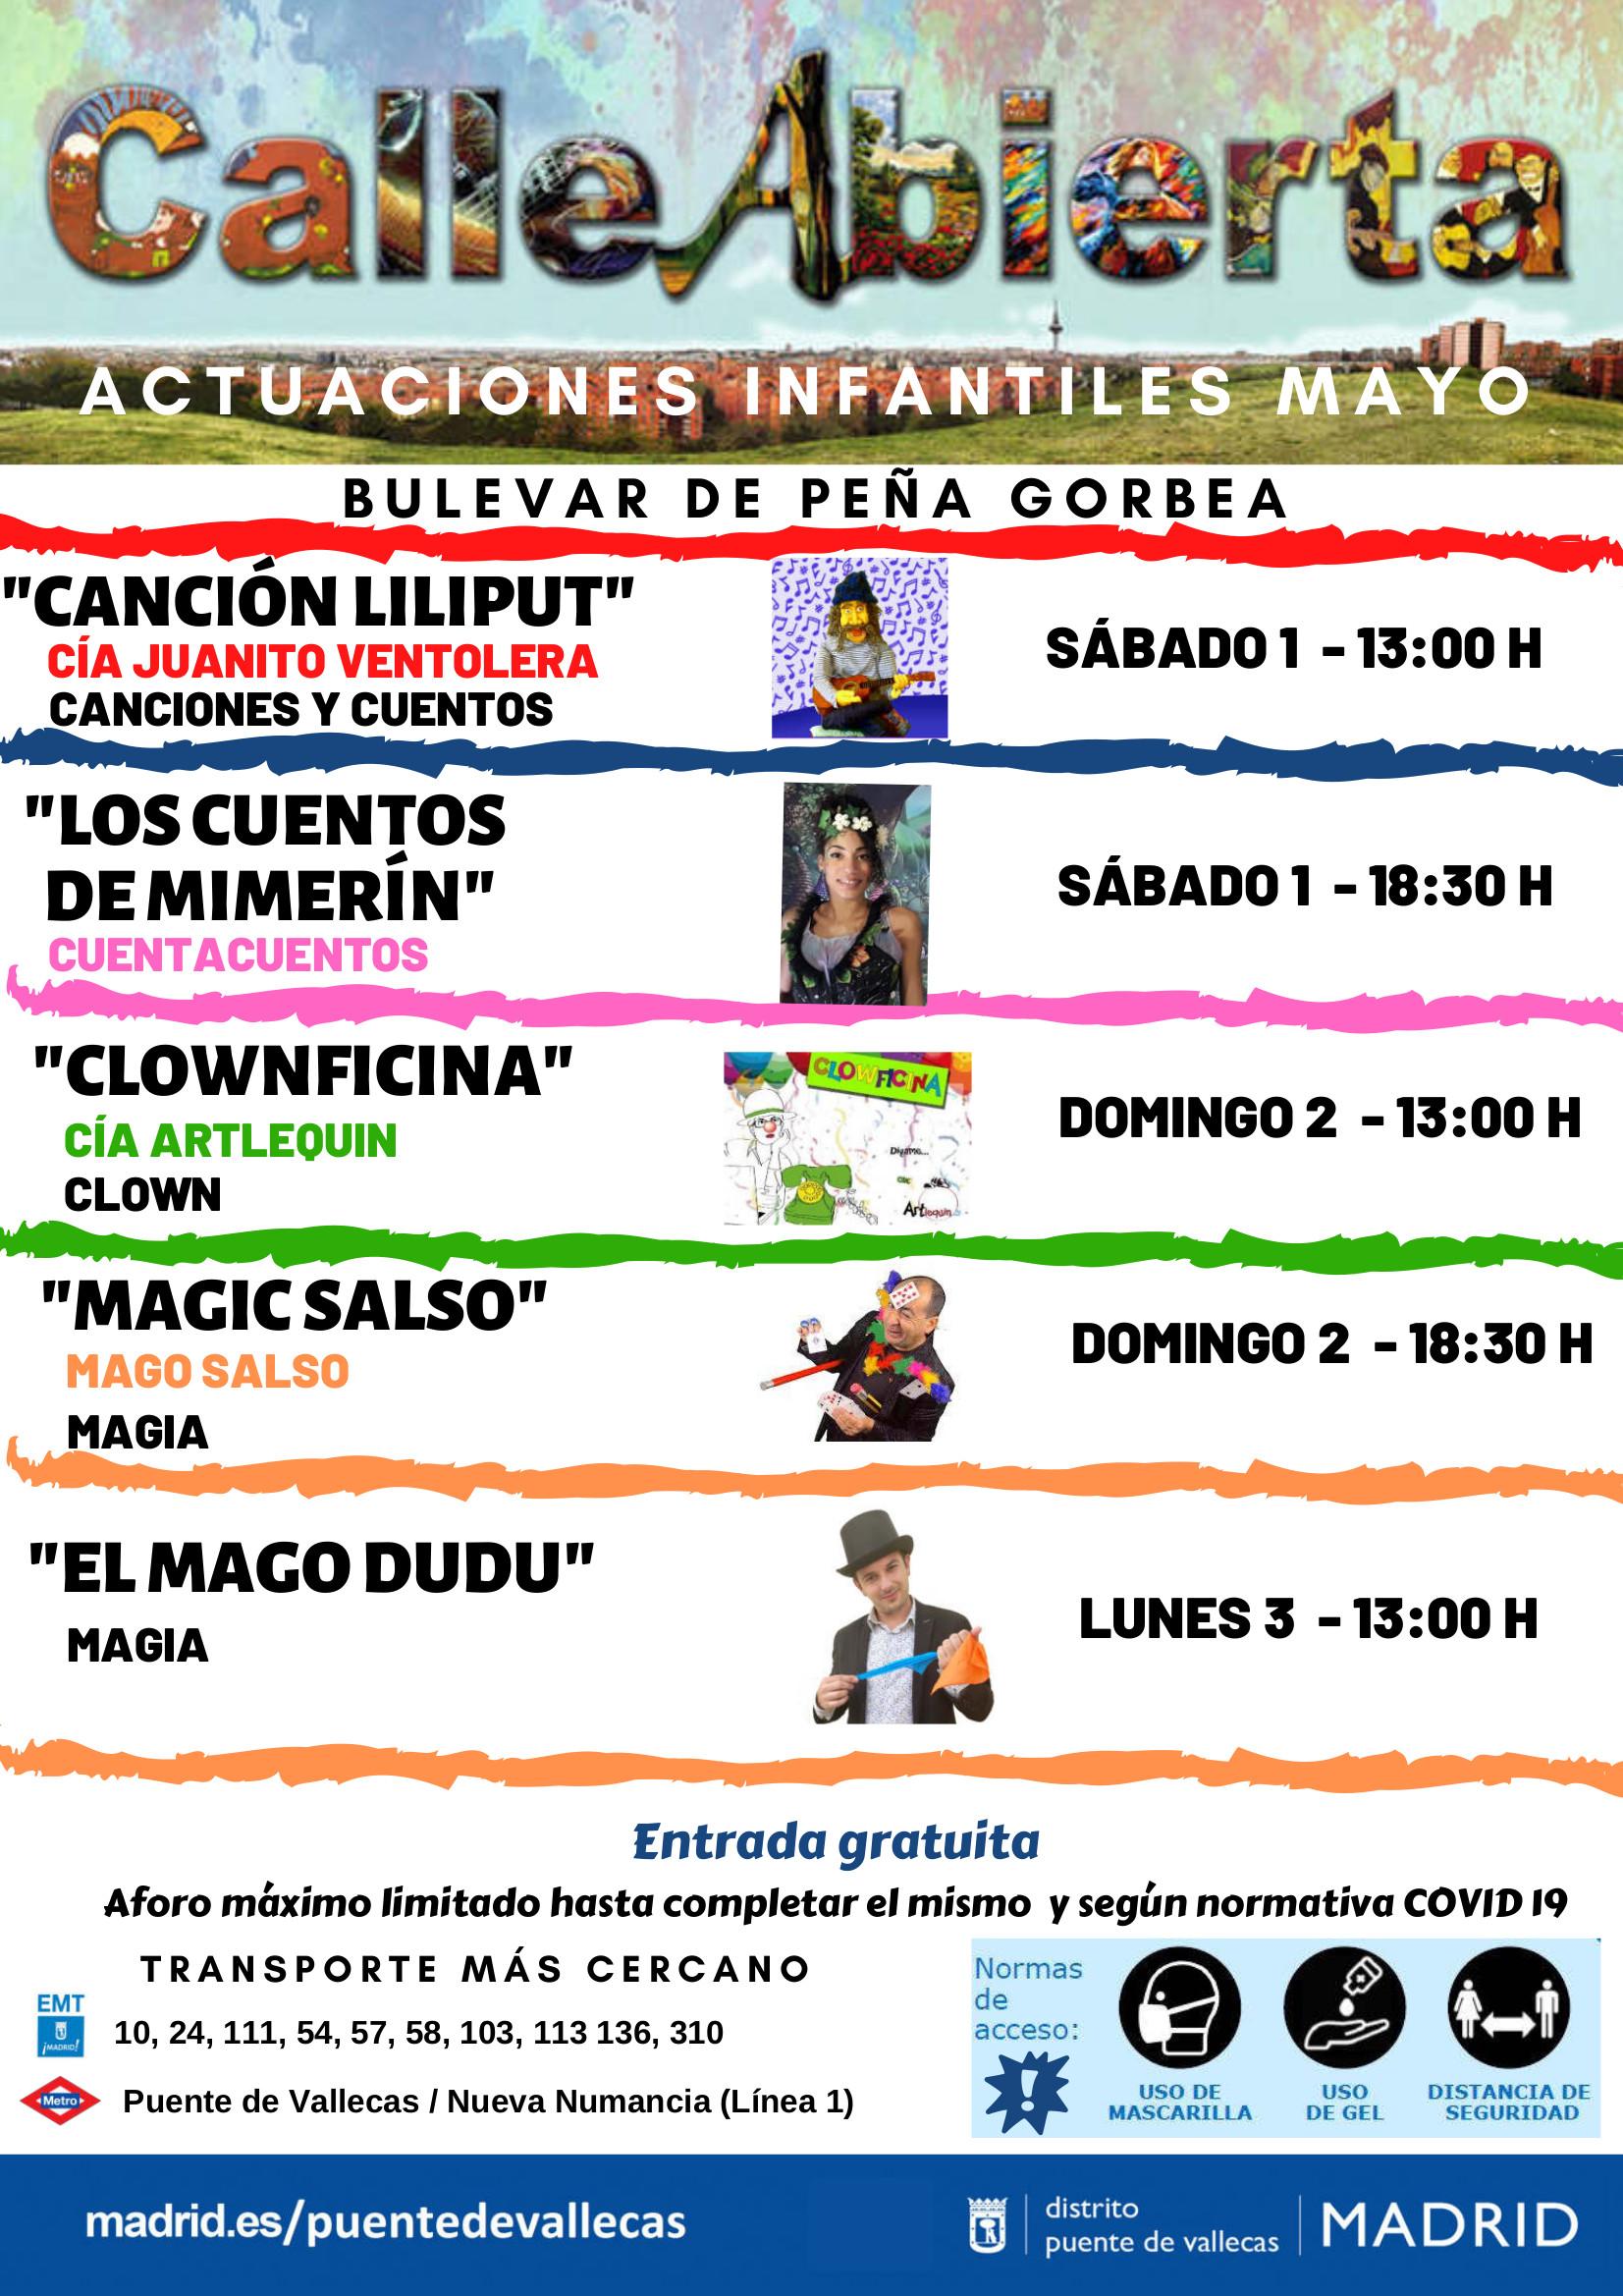 Calle_abierta_mayo Vallecas